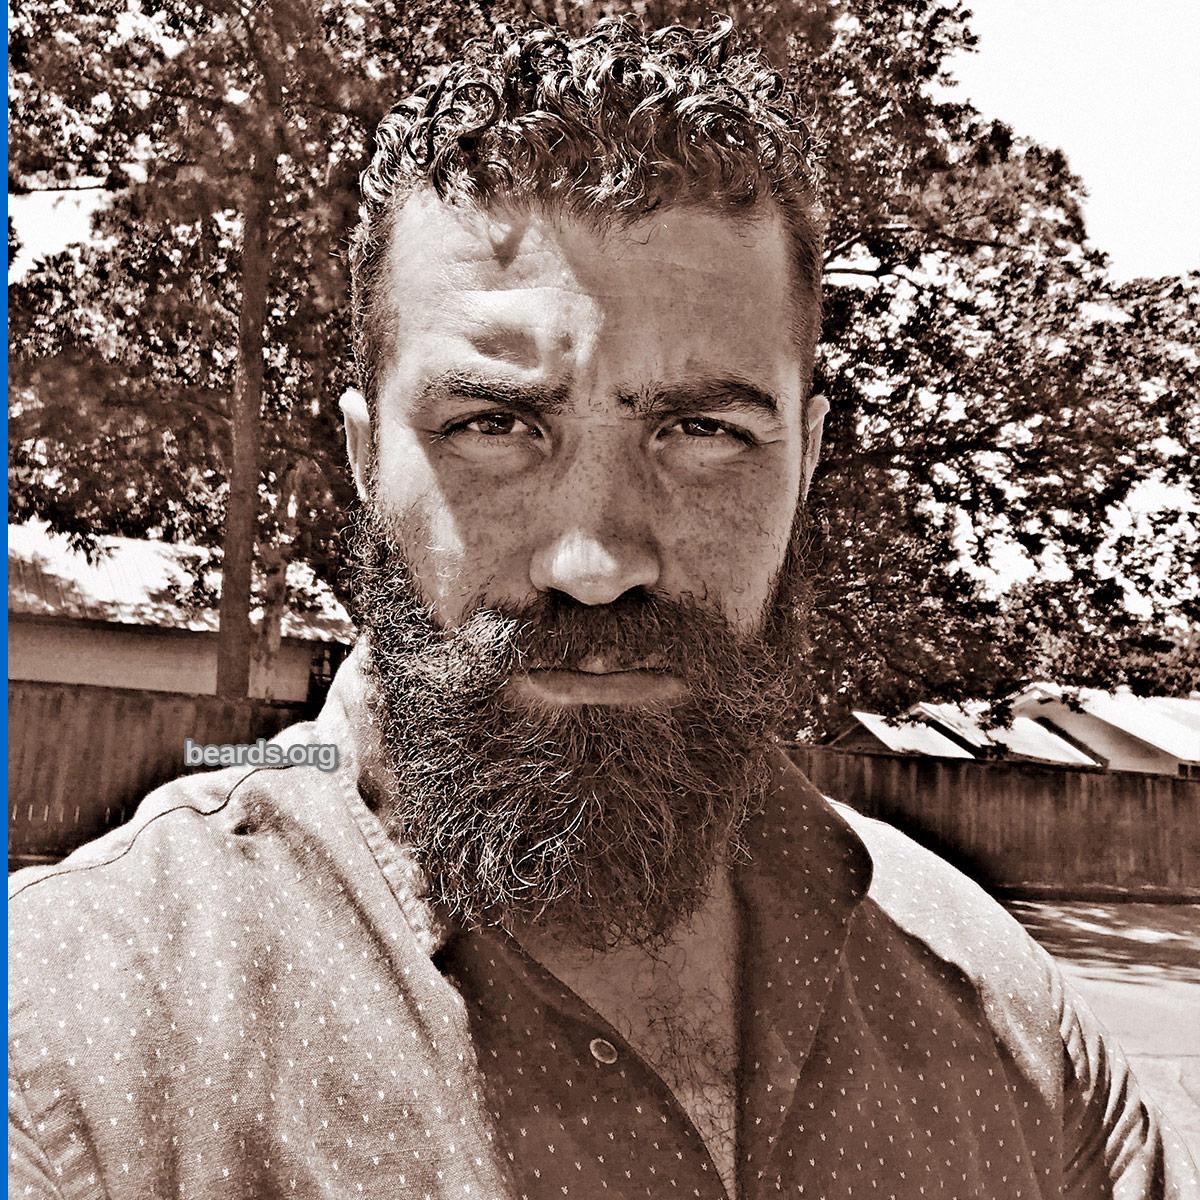 Sam, beard photo 1